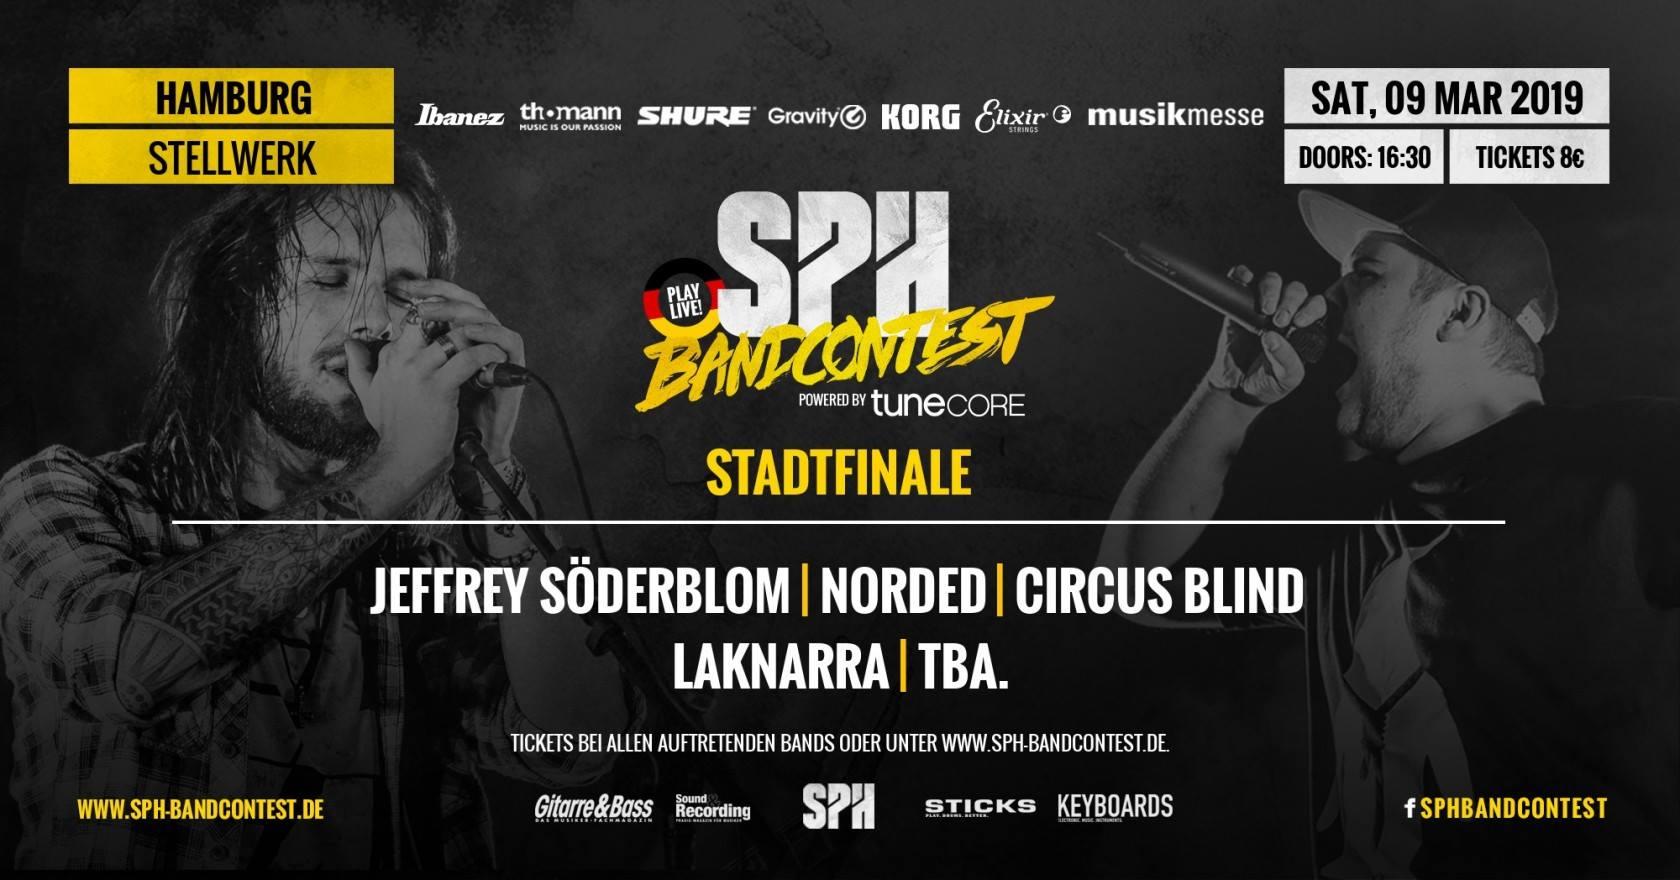 SPH Bandcontest Stadtfinale // HamburgSPH Bandcontest Stadtfinale // Hamburg